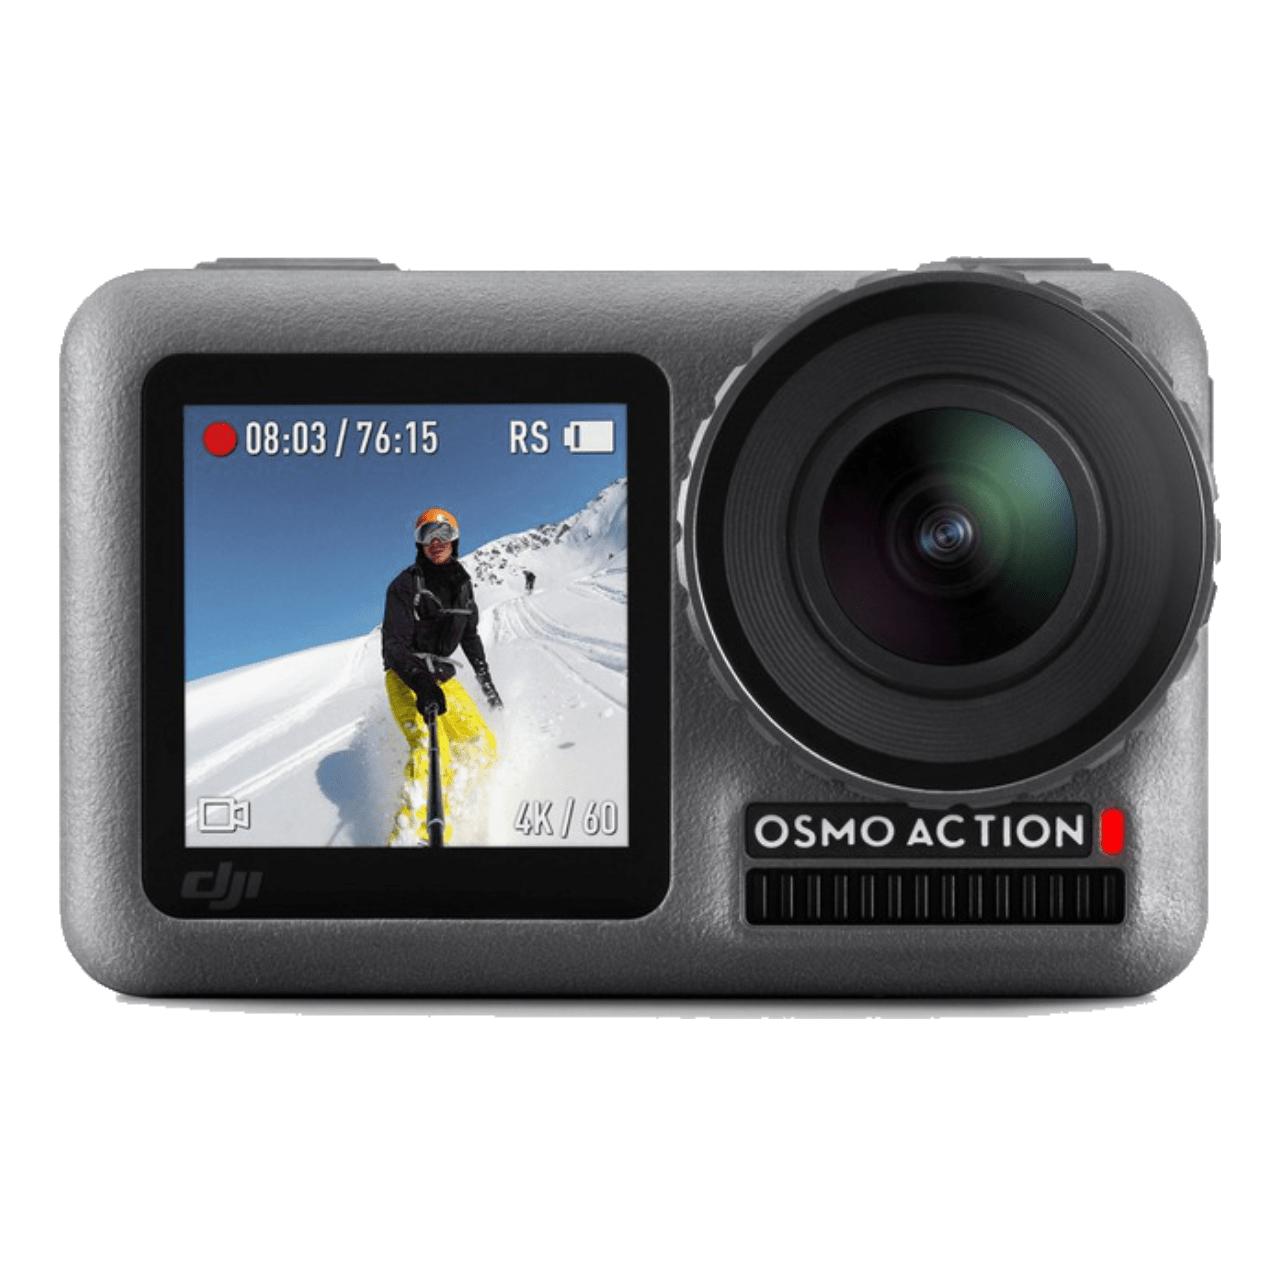 Caméra sportive Dji Osmo Action + Kit de recharge Part 3 Charging Kit (2 batteries + chargeur)